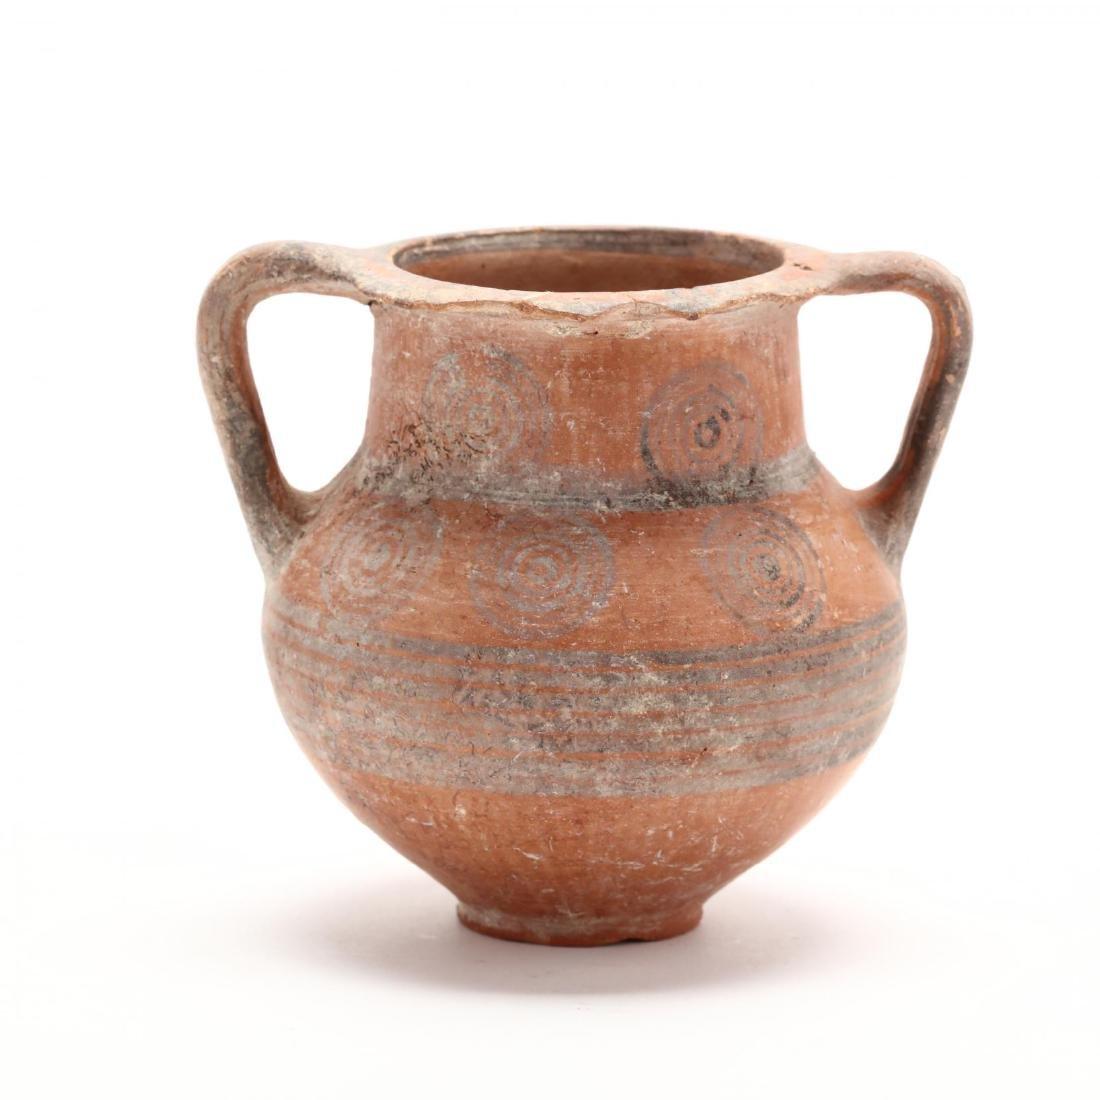 Cypro-Archaic Footed Amphoriskos - 4